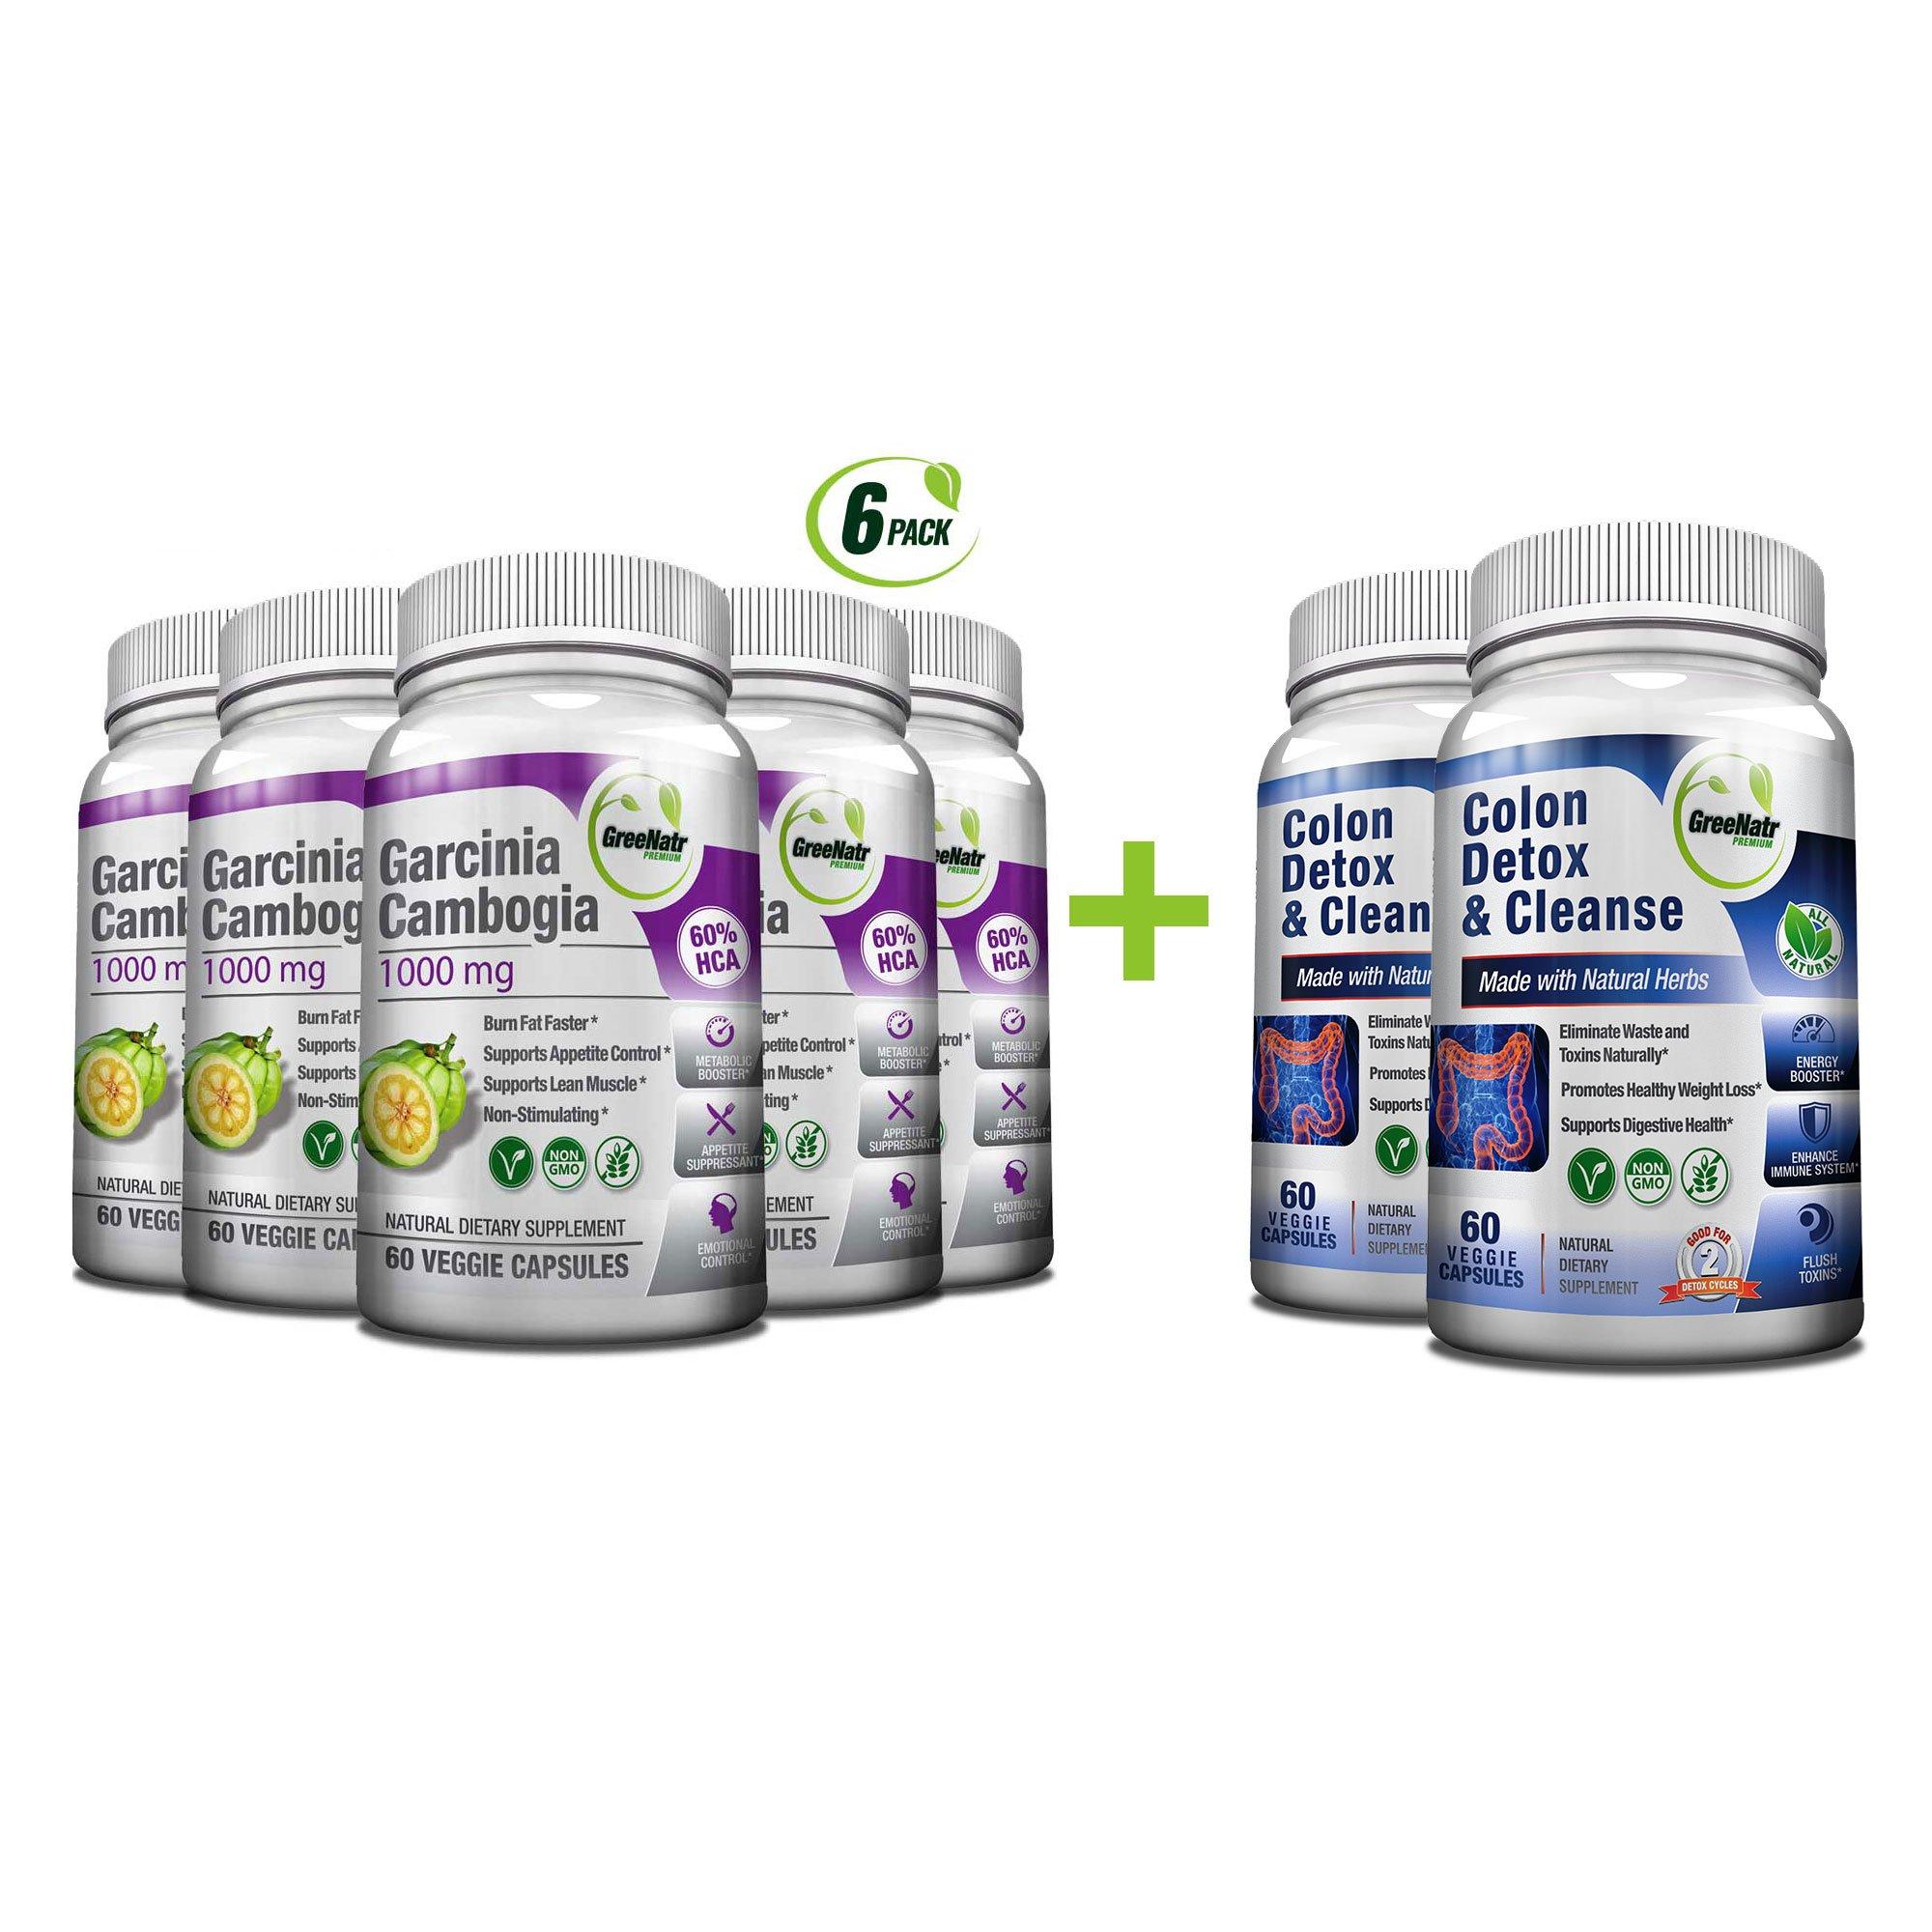 Colon Detox & Cleanse + Pure Garcinia Cambogia Extract- Weight Loss Bundle/480 Veggie Capsules-Gluten Free-Non GMO